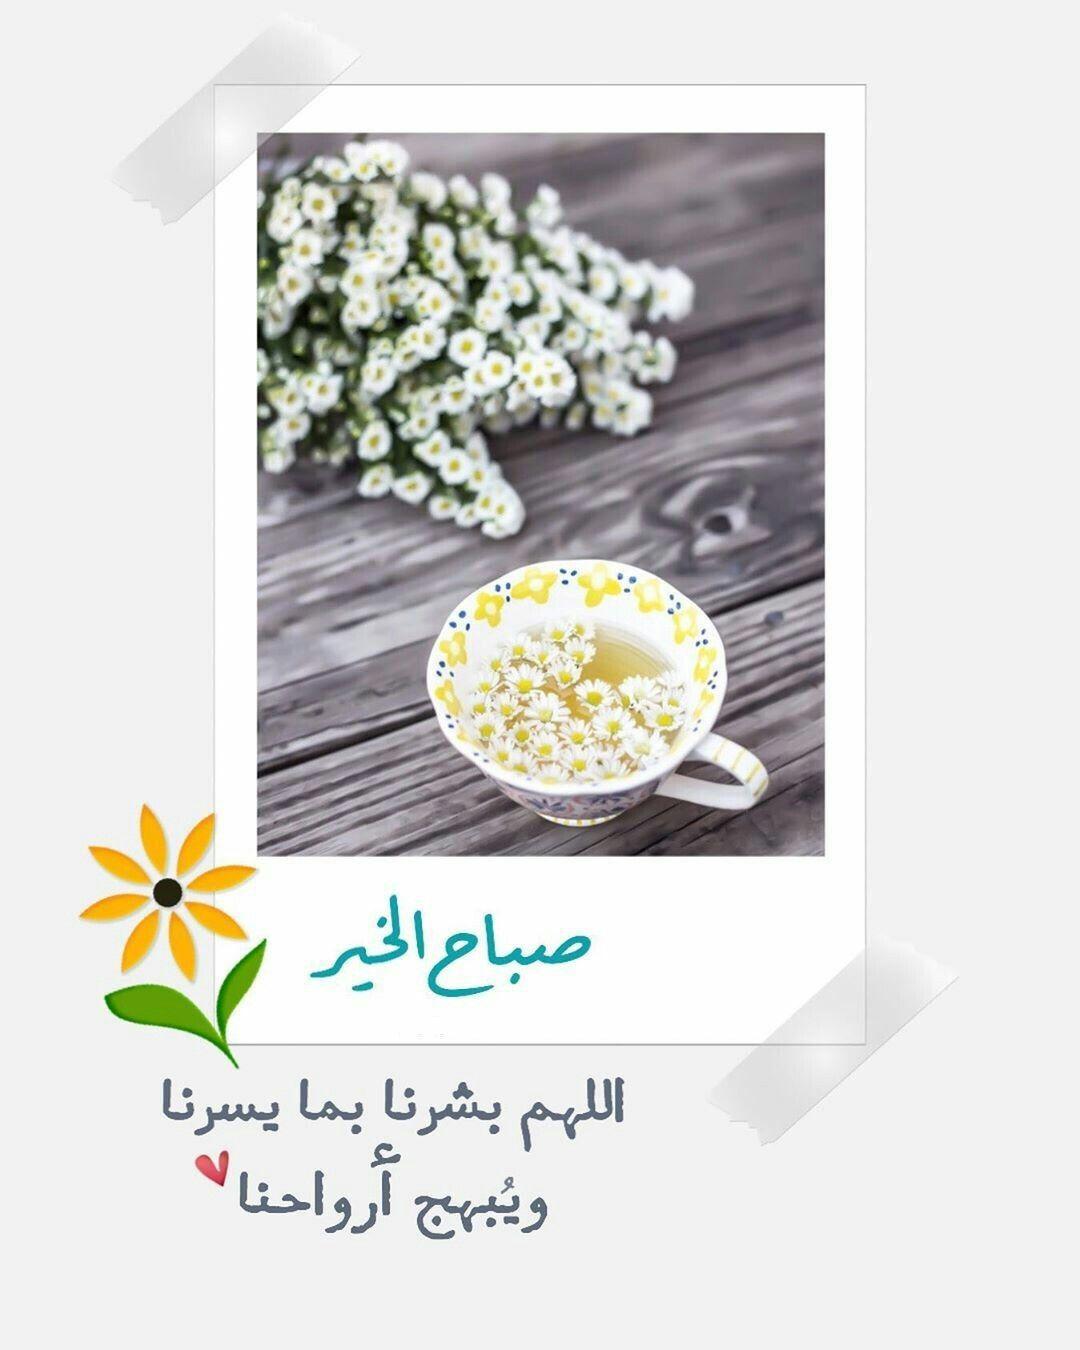 Pin By Mariam On صباح الخير Good Morning Good Morning Photos Good Morning Images Morning Images